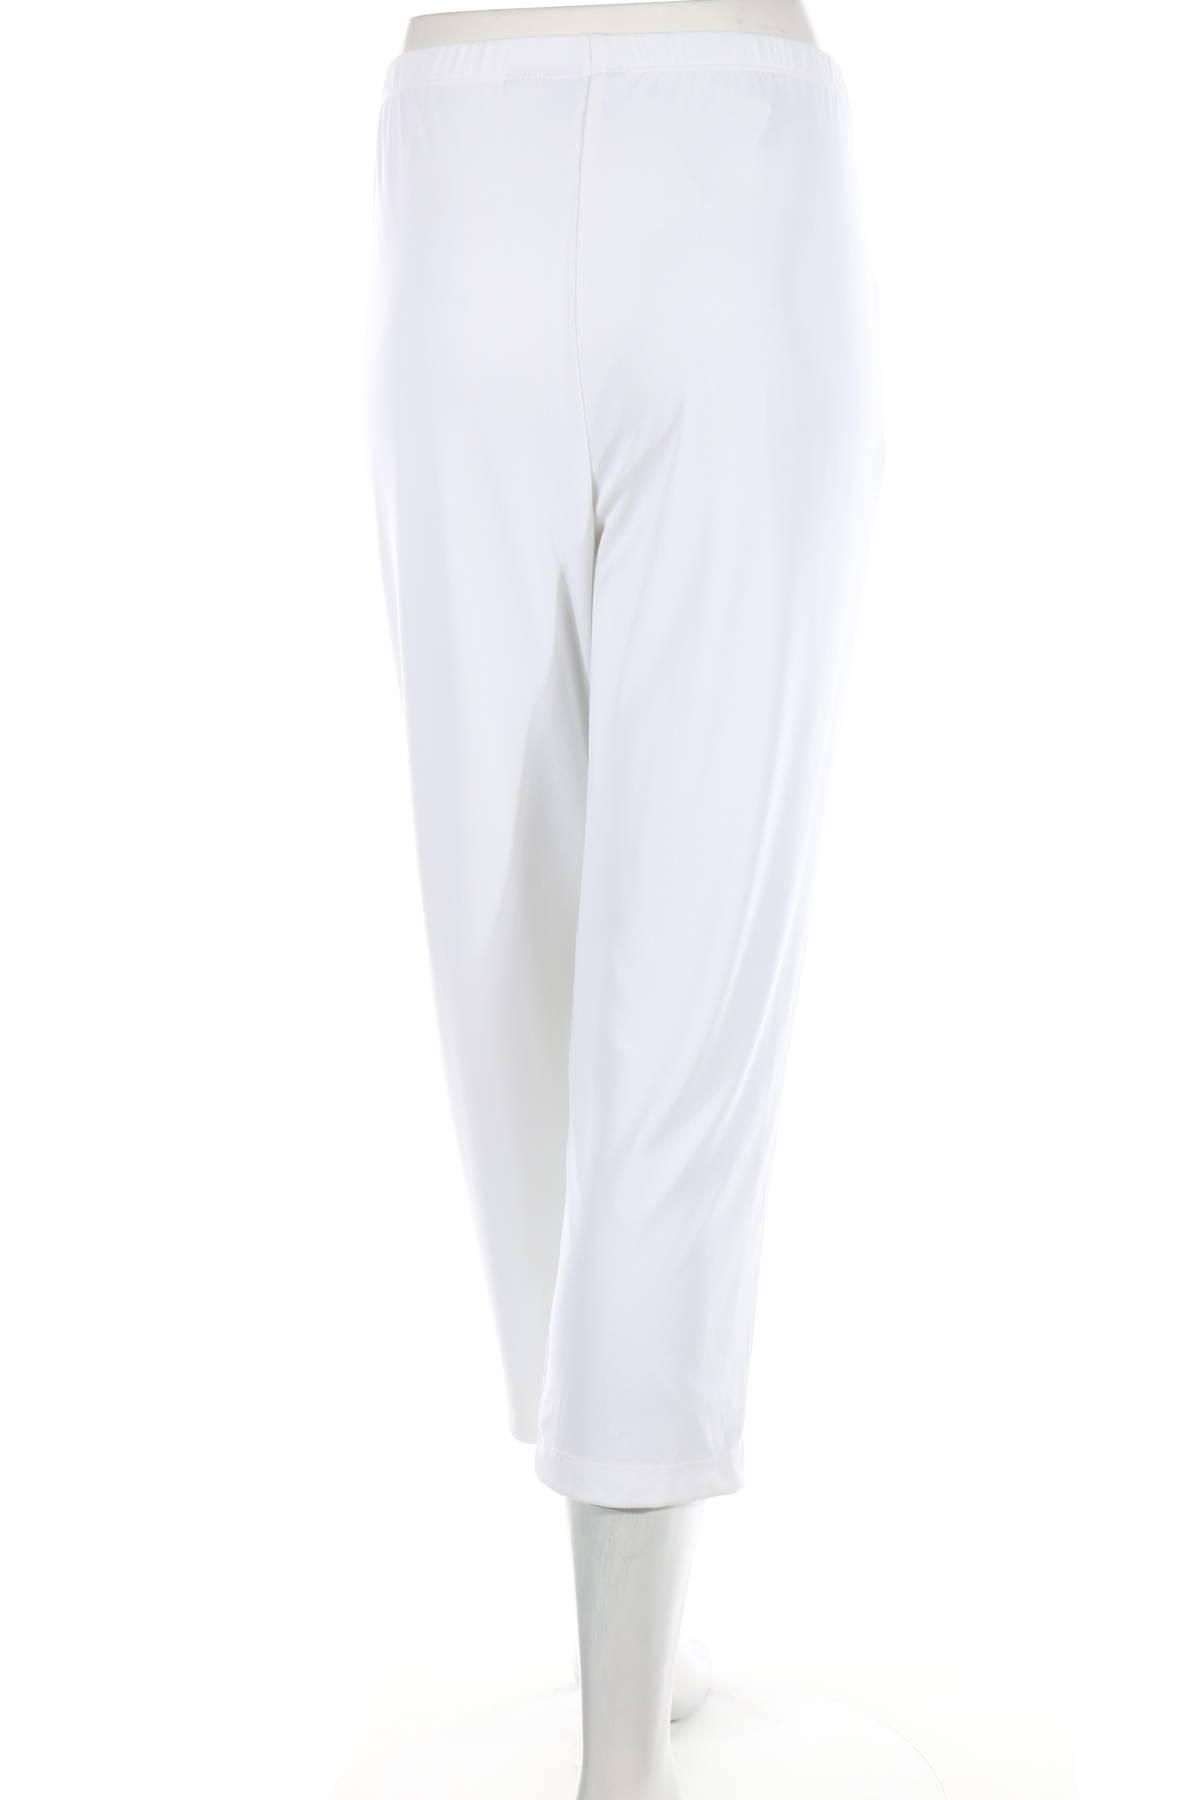 Панталон Easywear by Chicos2